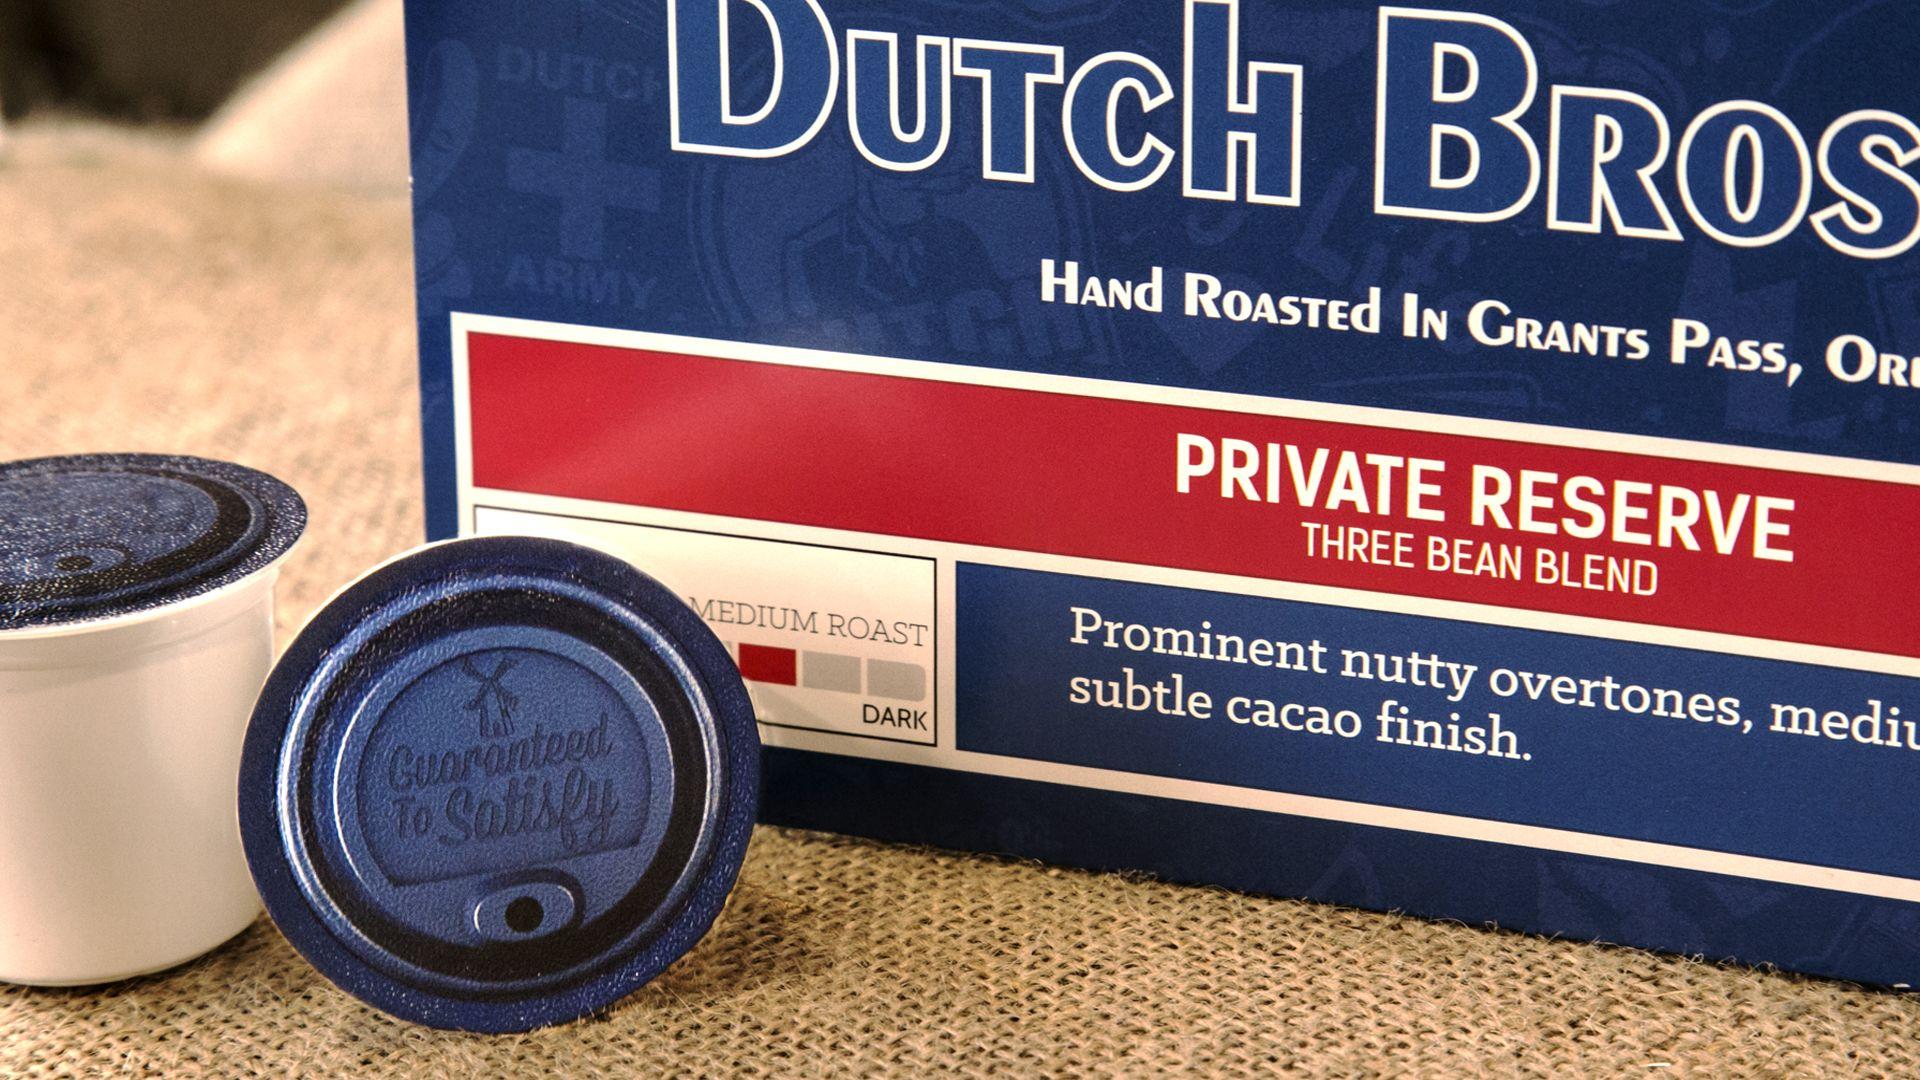 27+ White coffee beans dutch bros ideas